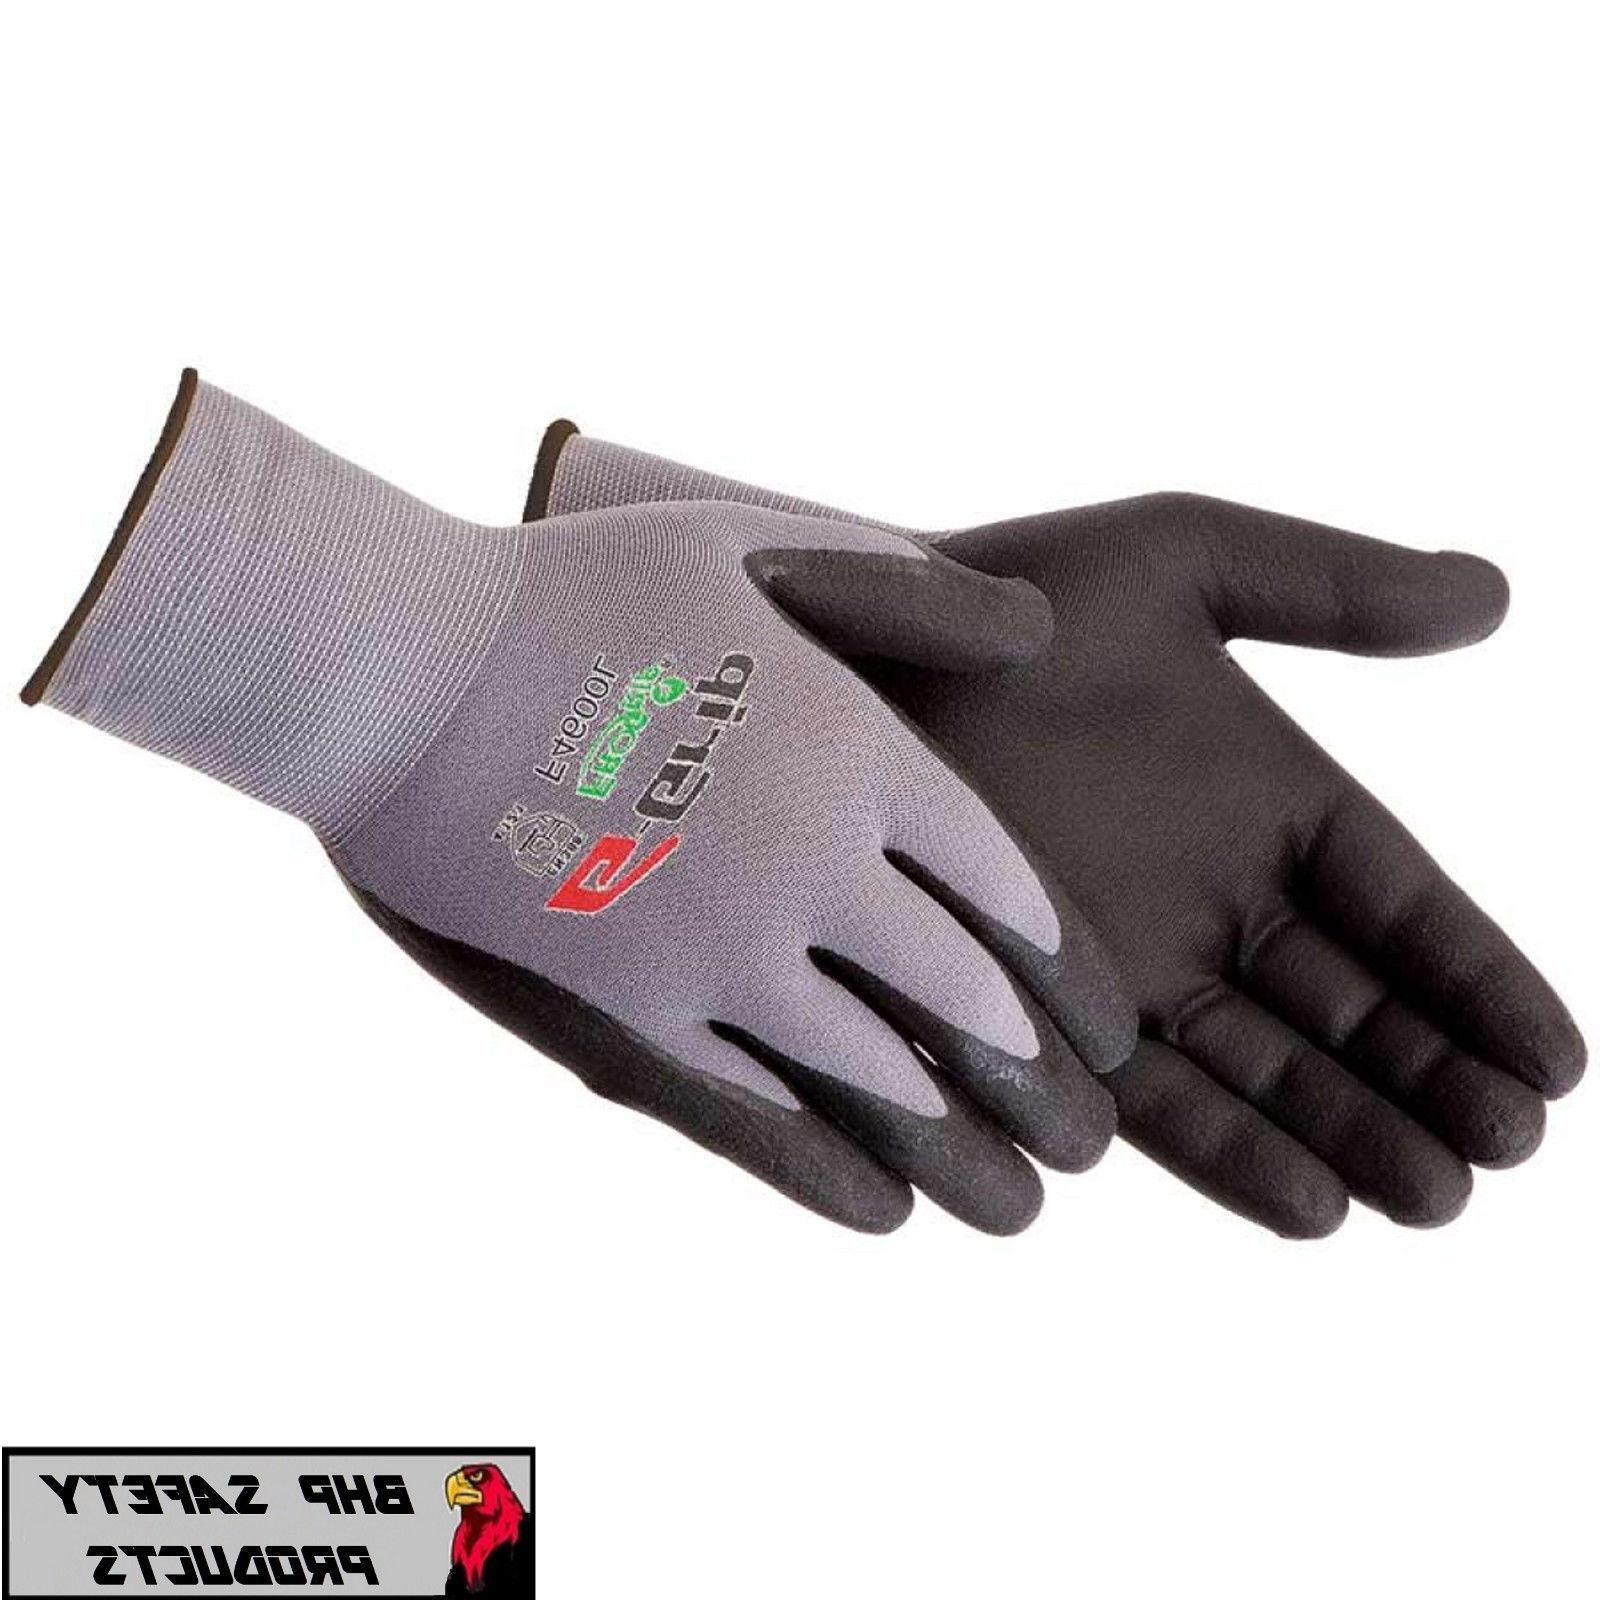 Foam Nitrile Foam-Palm Coated